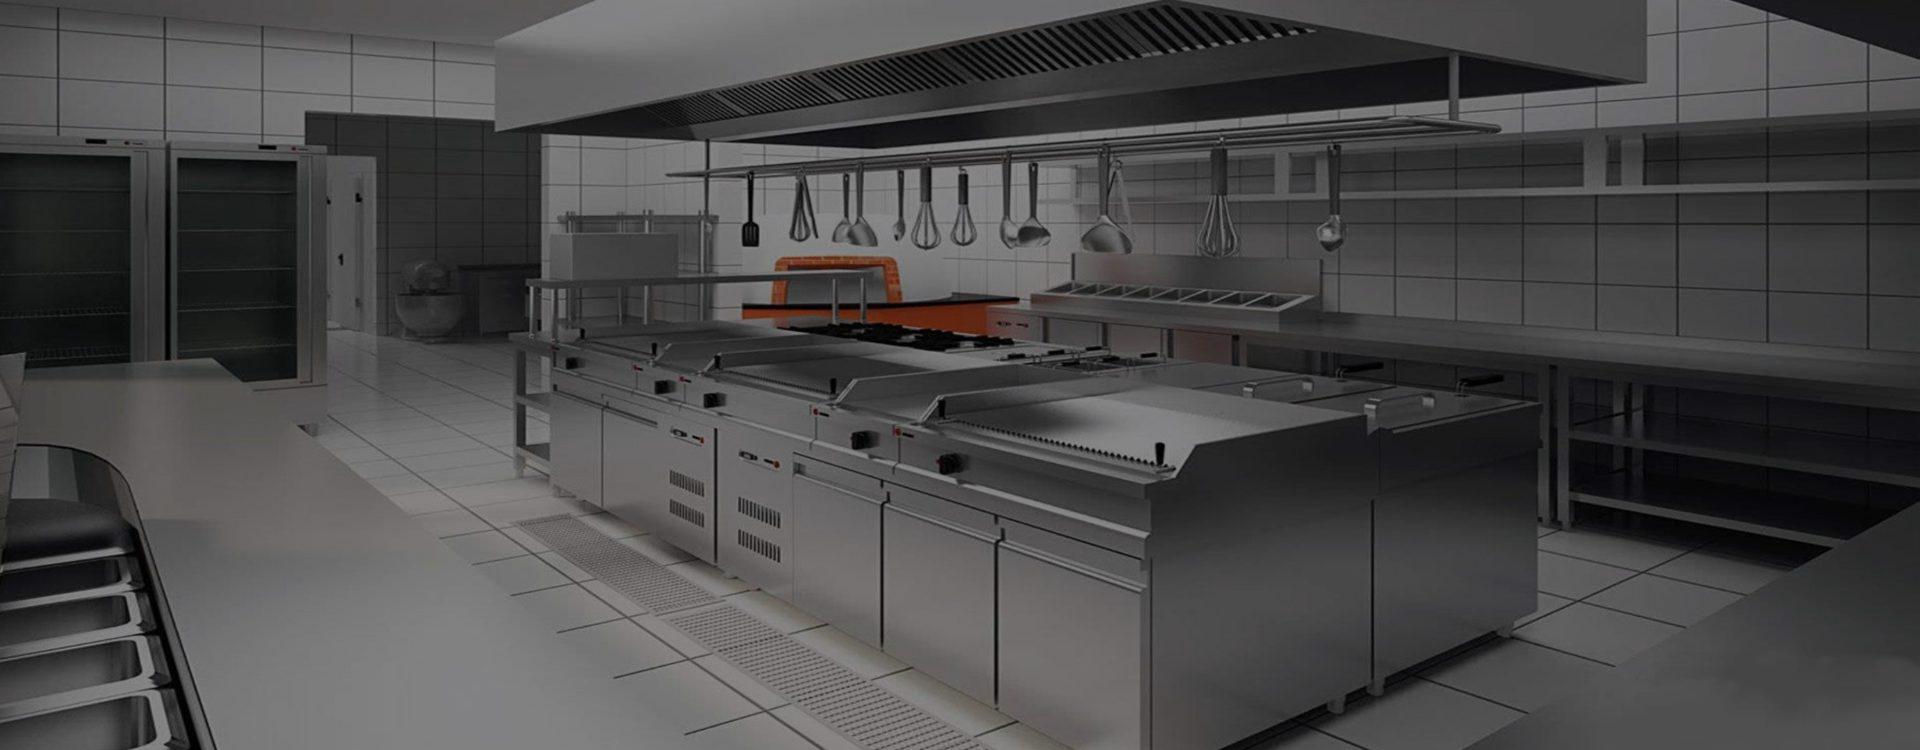 ikinci el mutfak malzemeleri